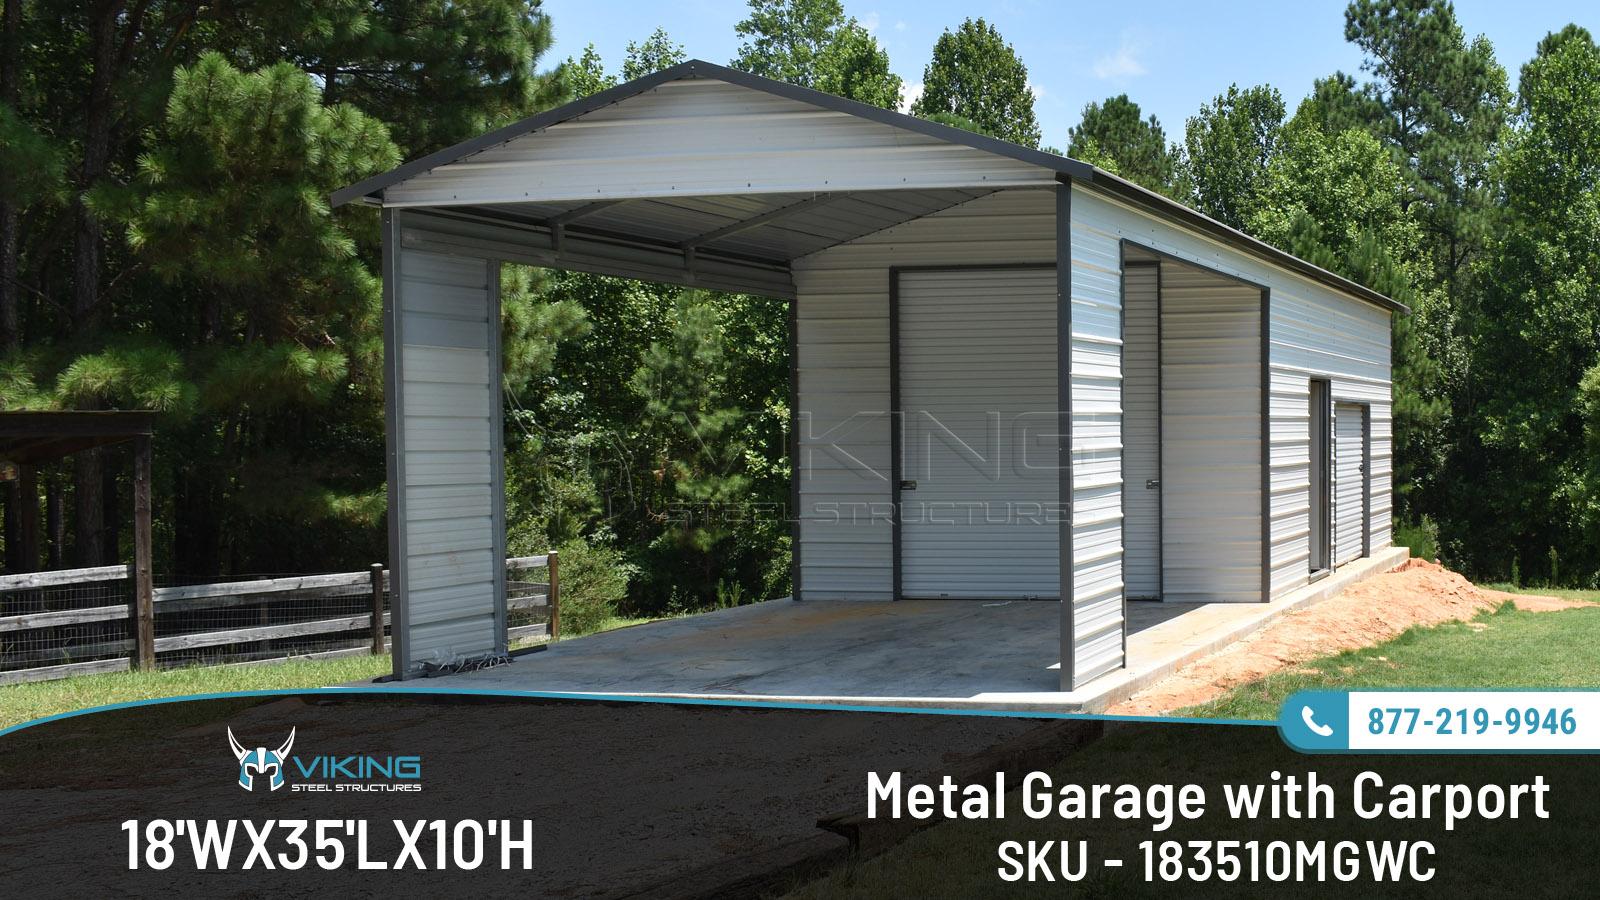 18 W X 35 L X 10 H Metal Garage With Carport